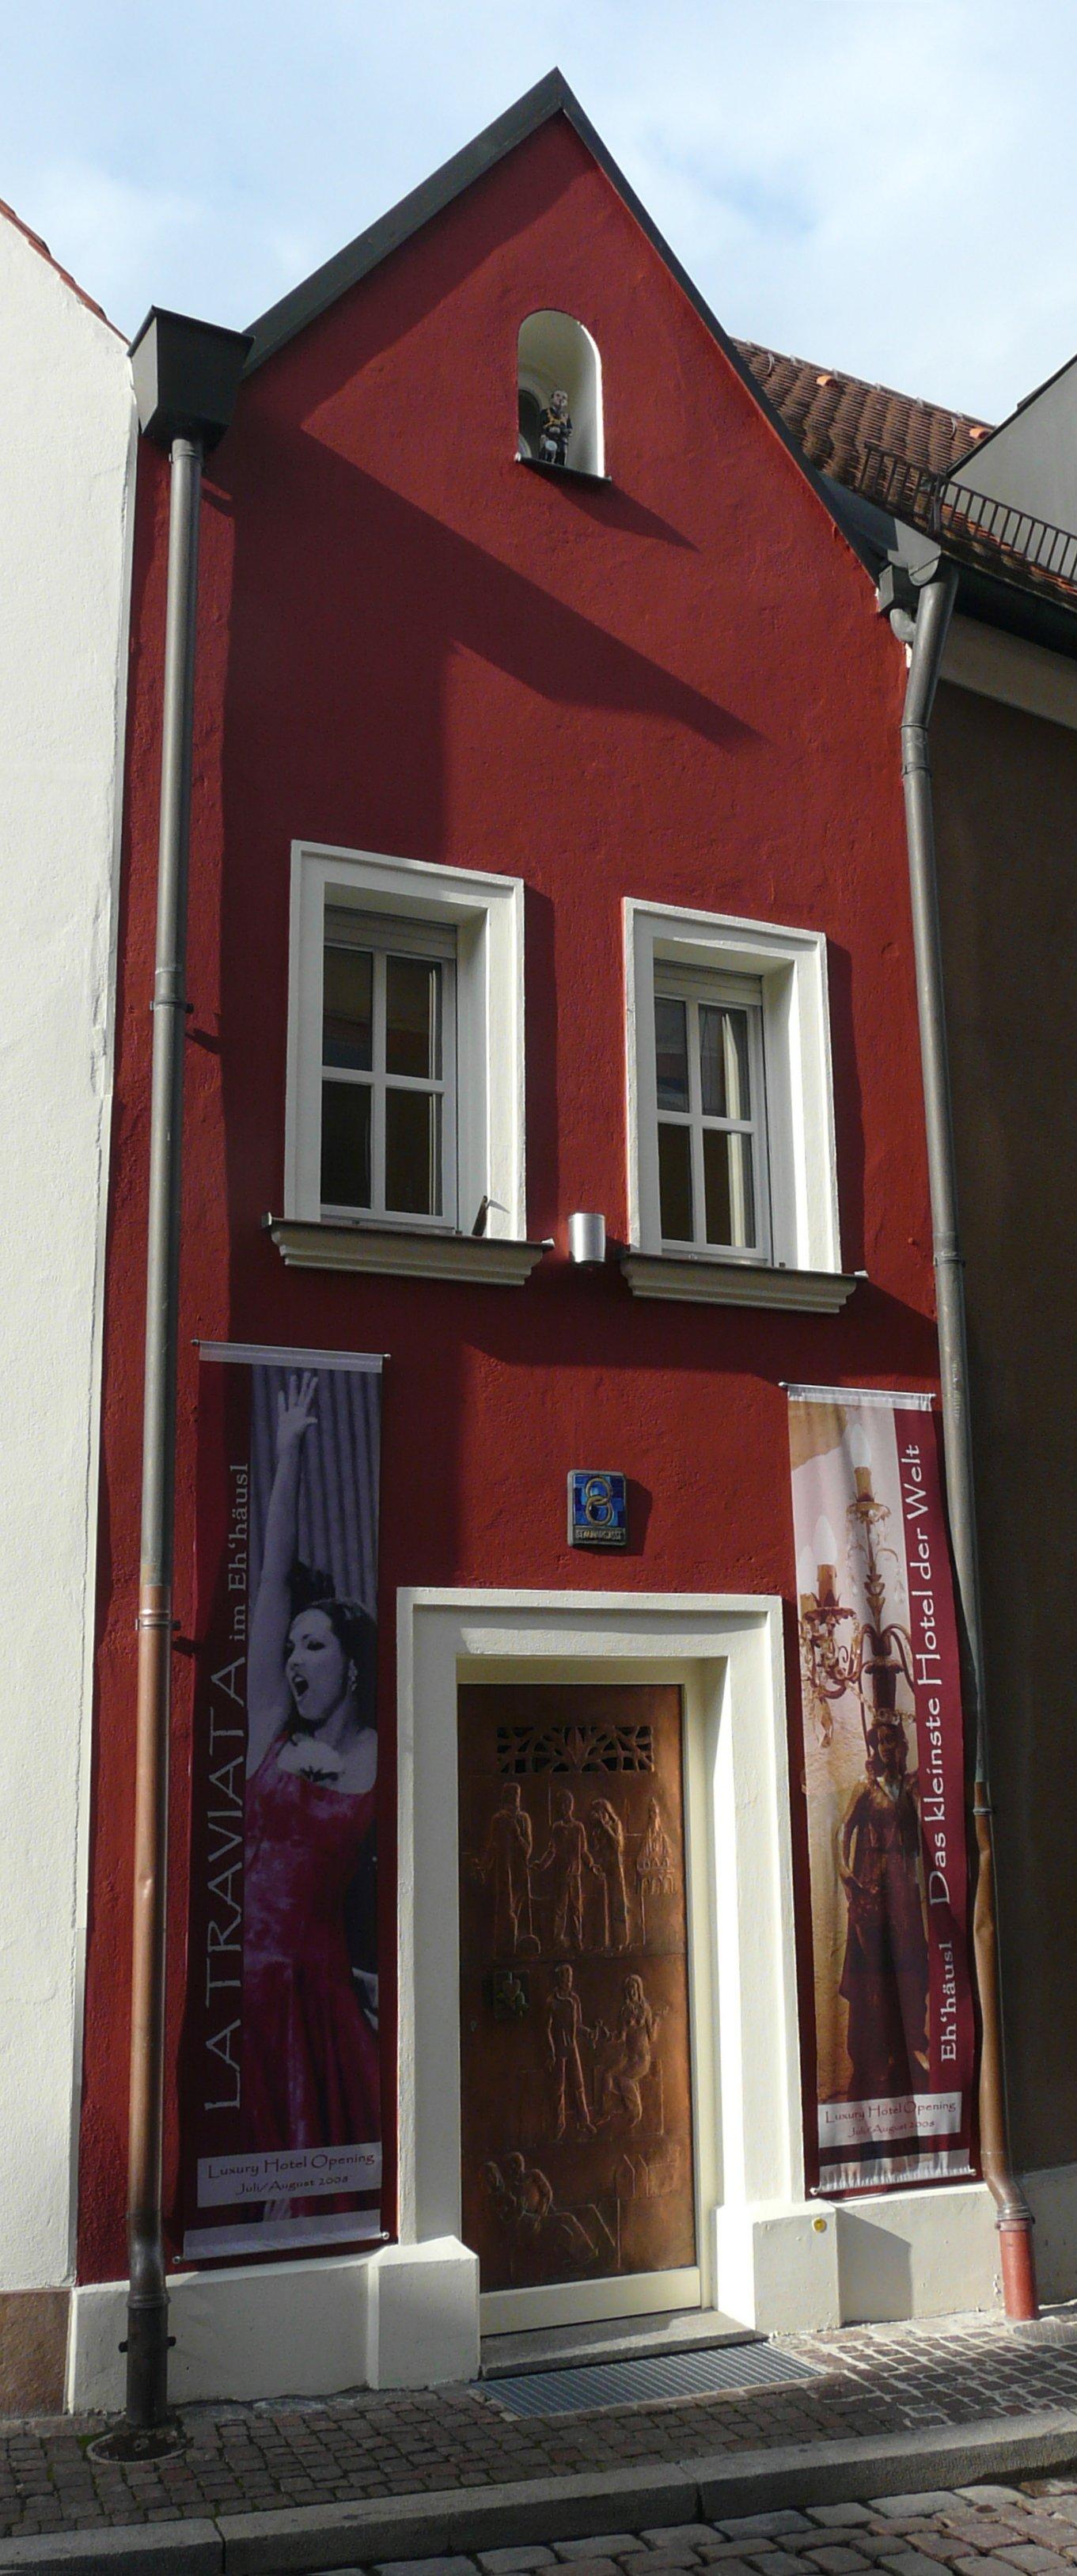 the world 39 s smallest hotel eh 39 h usl amberg germany. Black Bedroom Furniture Sets. Home Design Ideas